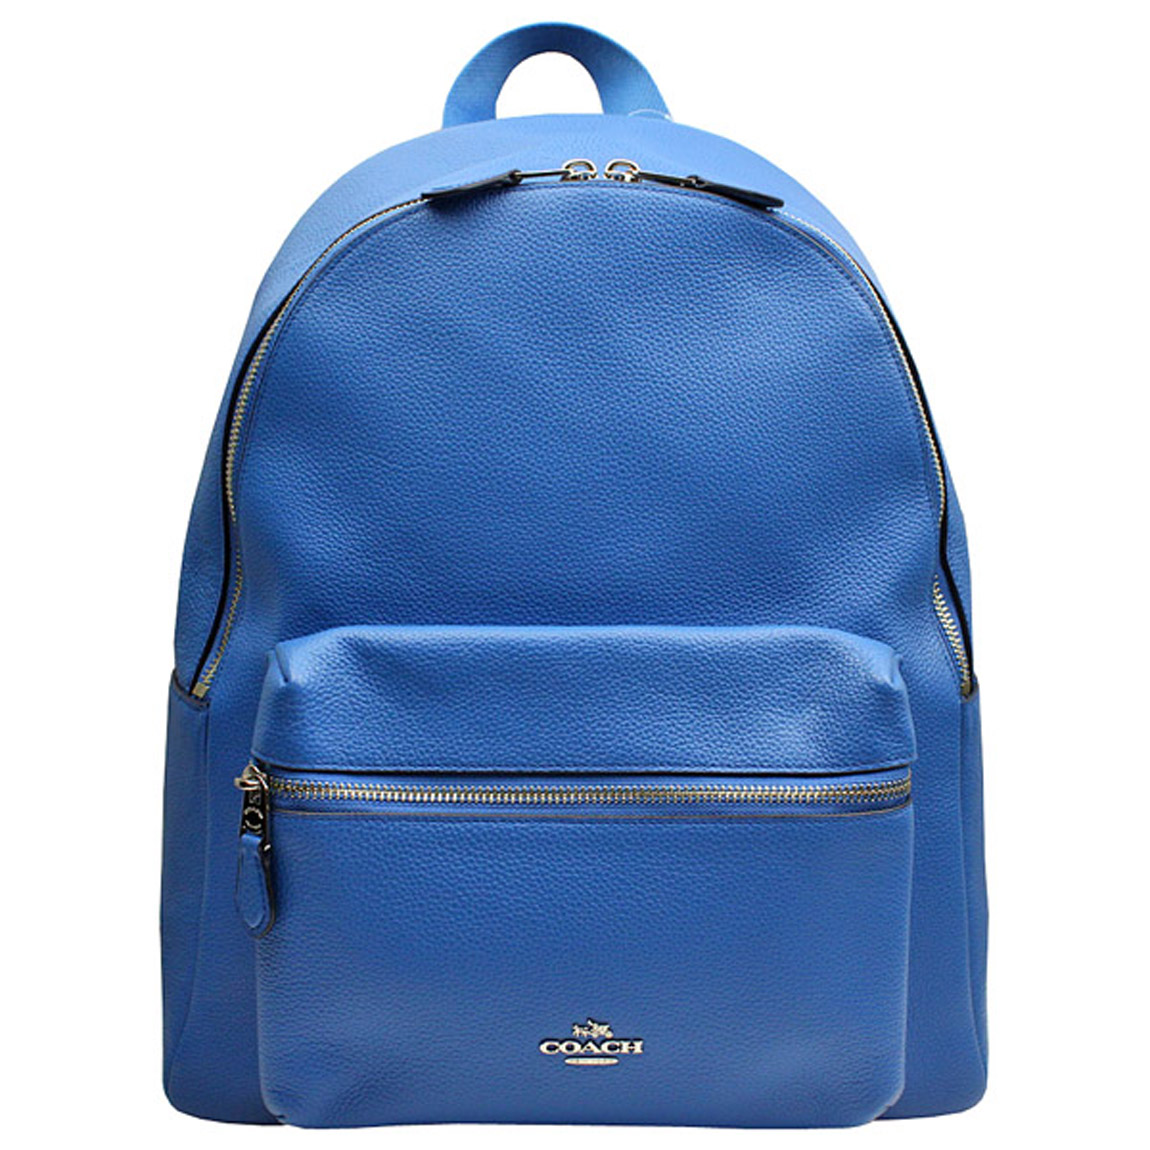 【COACH】立體馬車標誌 荔枝紋全皮革後背包(藍色)